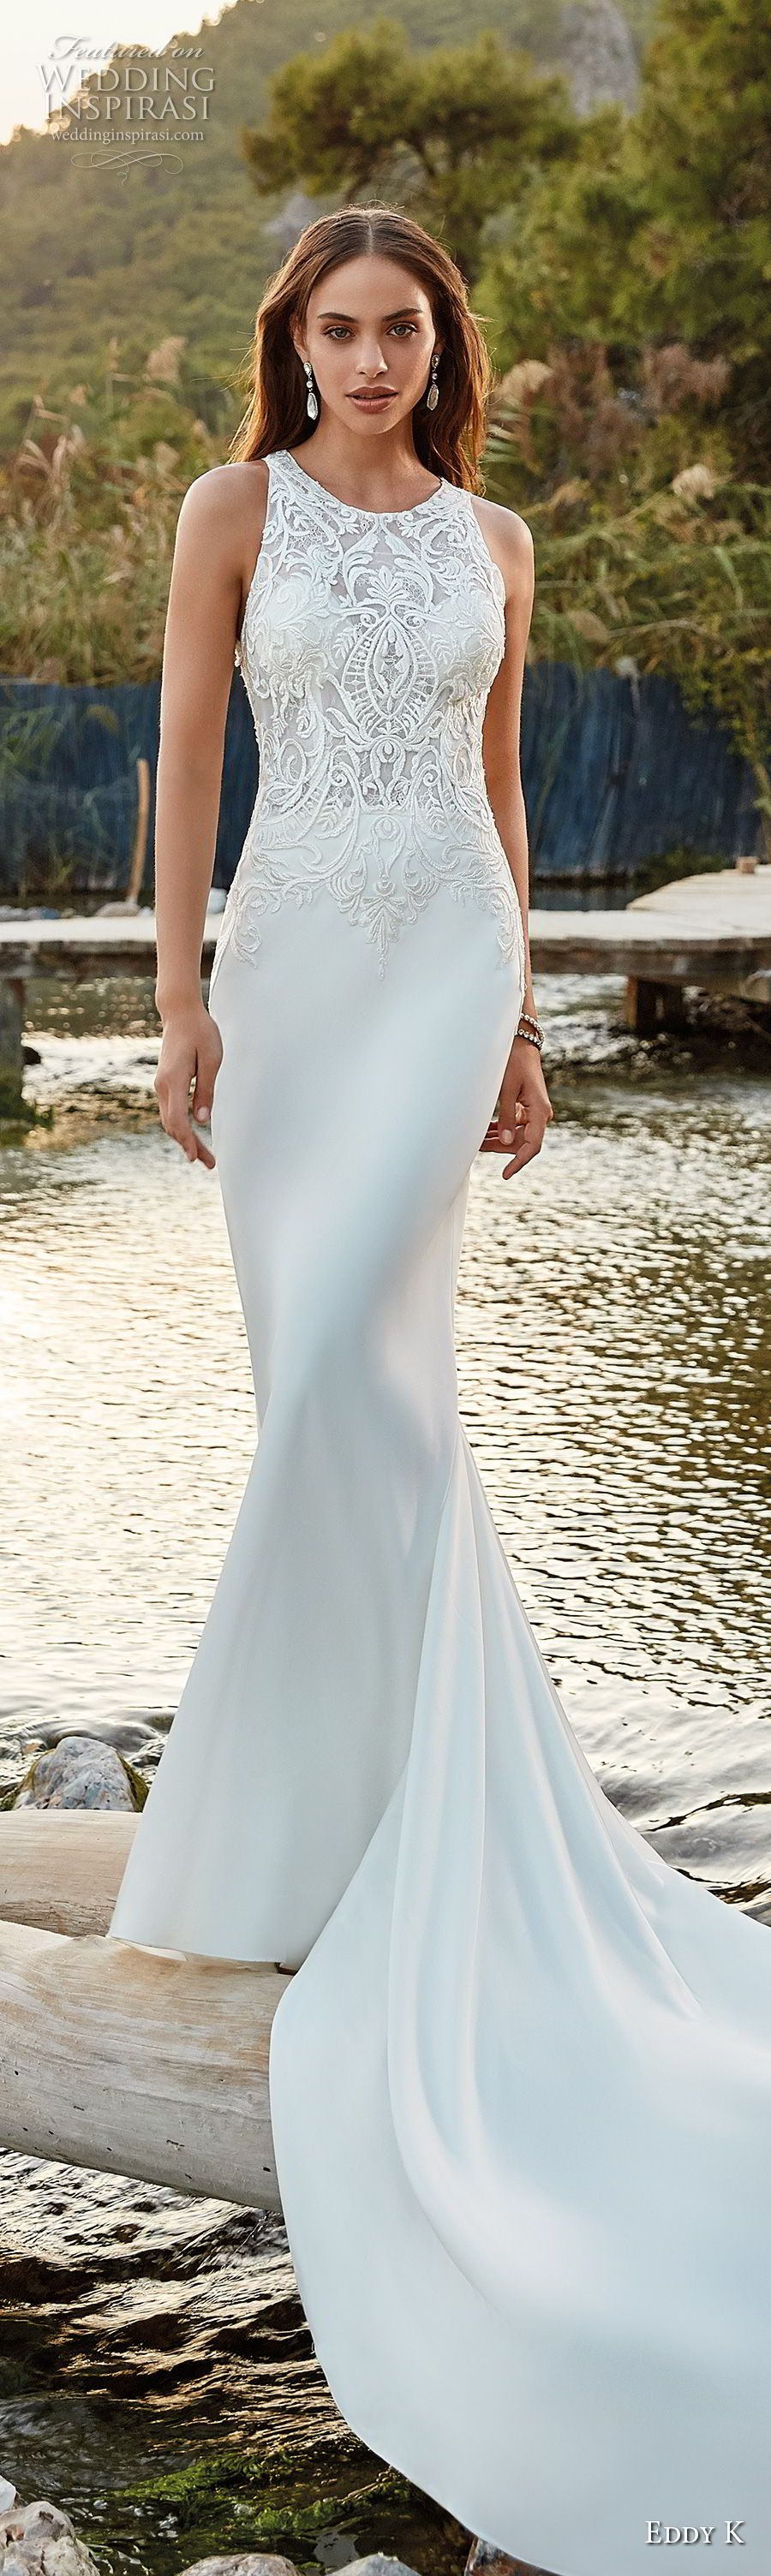 Eddy k dreams wedding dresses chapel train bodice and jewel